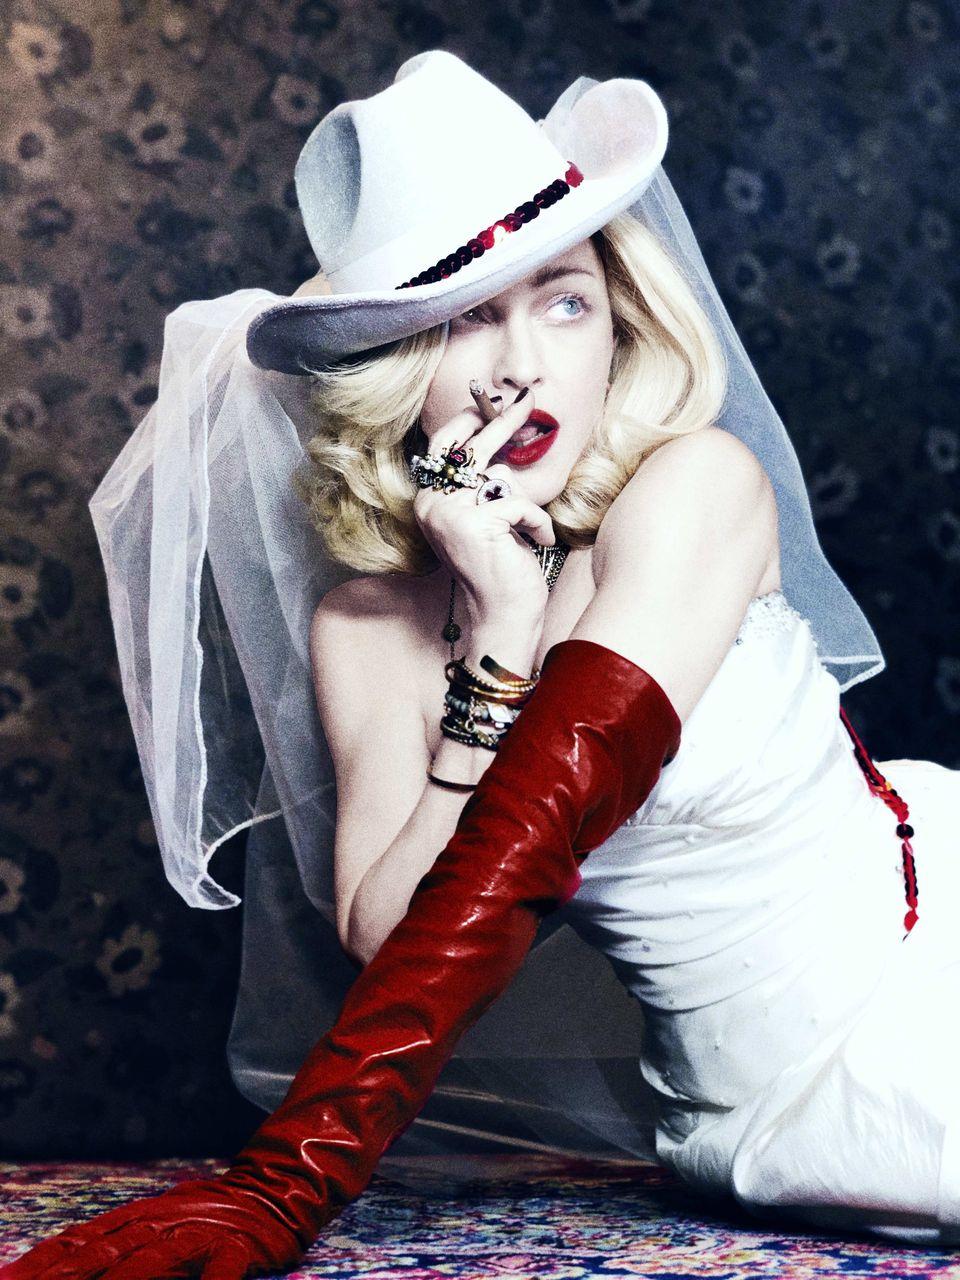 Madonna has now unveiled her new album, Madame